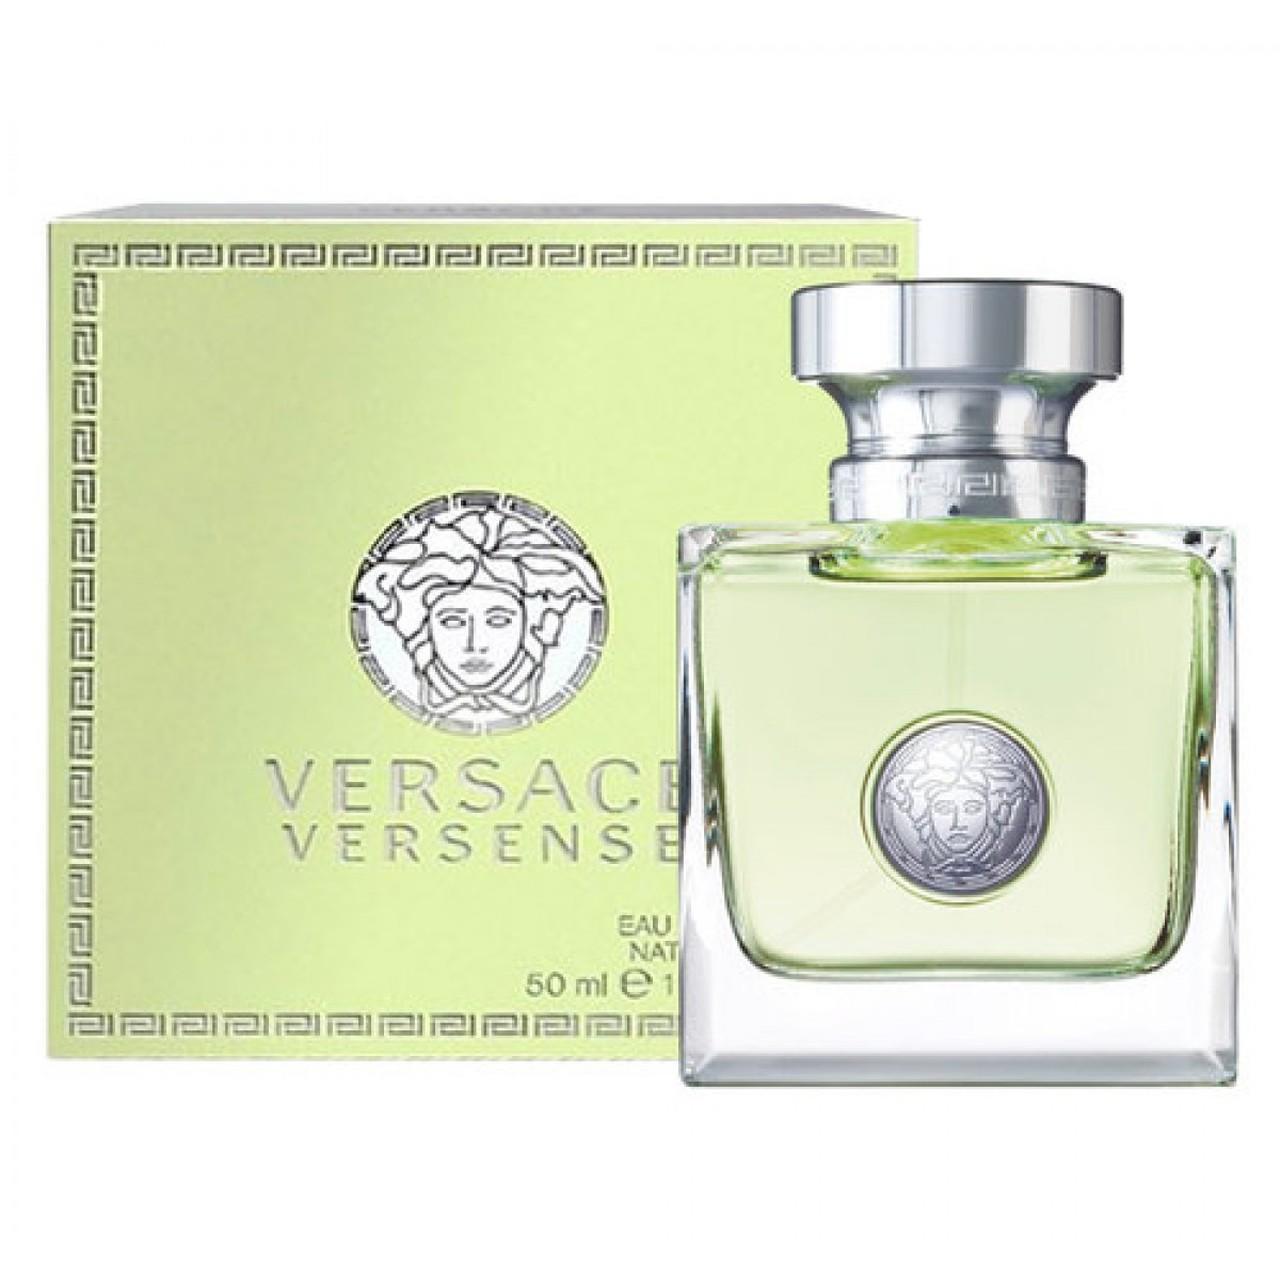 Versace Versense, 10.699 kr. (50 ml.)